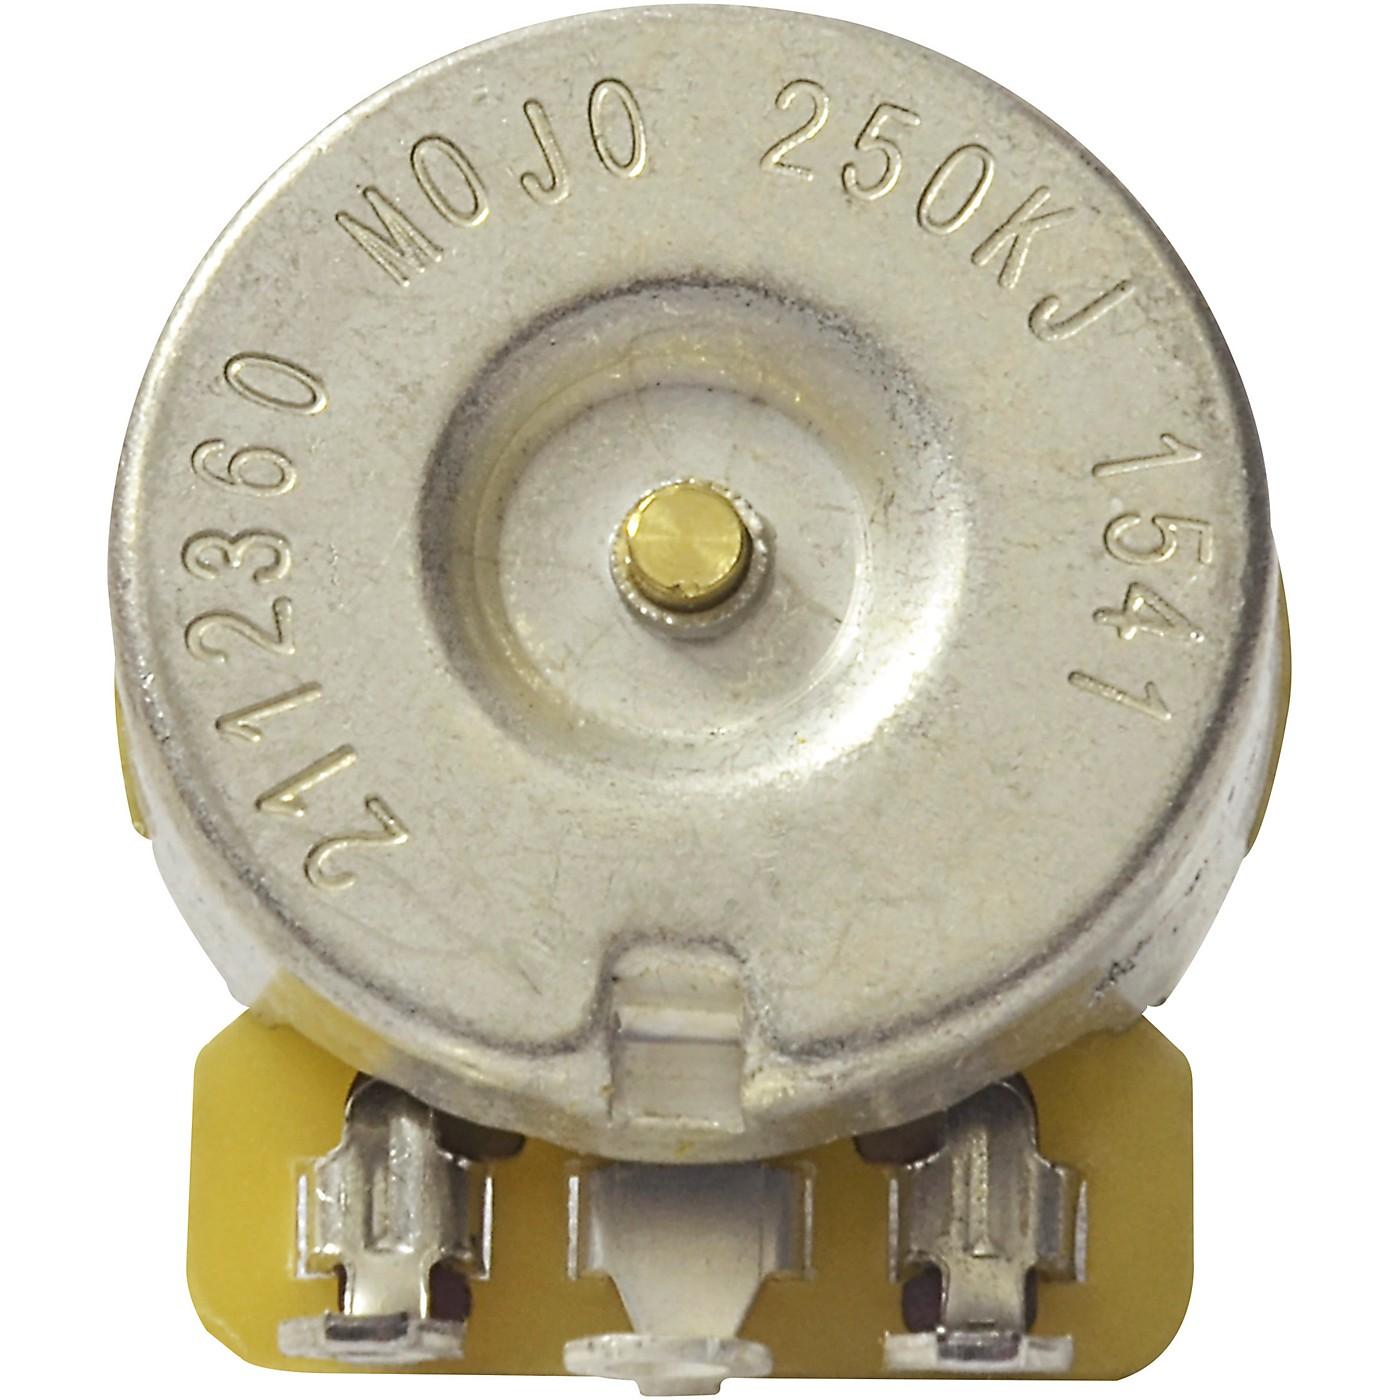 Mojotone Vintage Taper CTS 250K Solid Shaft Potentiometer thumbnail